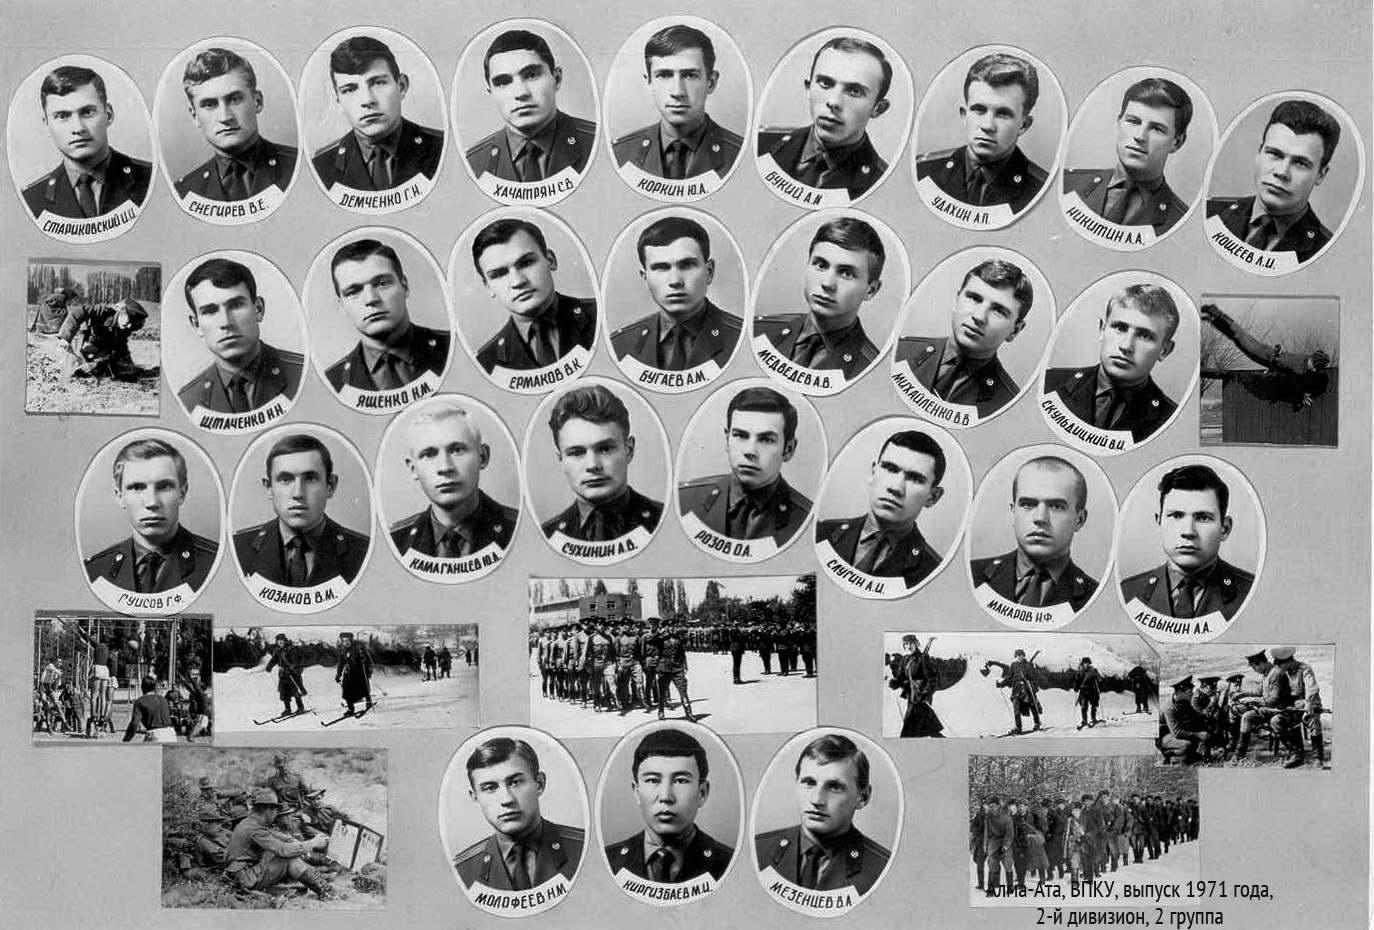 http://sevolvas.narod.ru/02.jpg